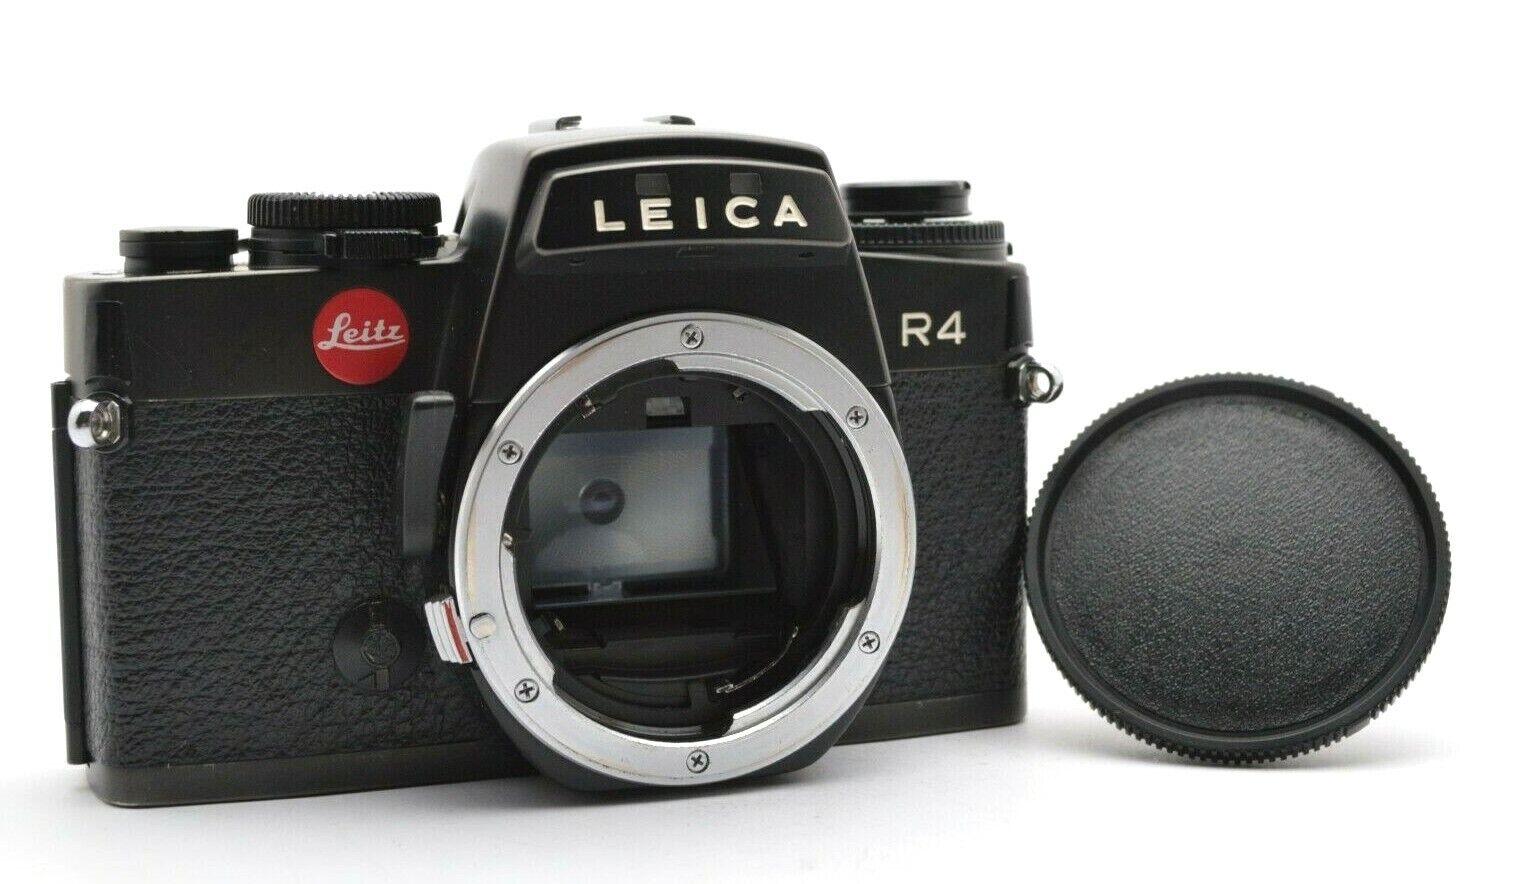 Leitz Leica R4 SLR-Kamera Analog Spiegelreflex Camera Body Gehäuse + Cap i117